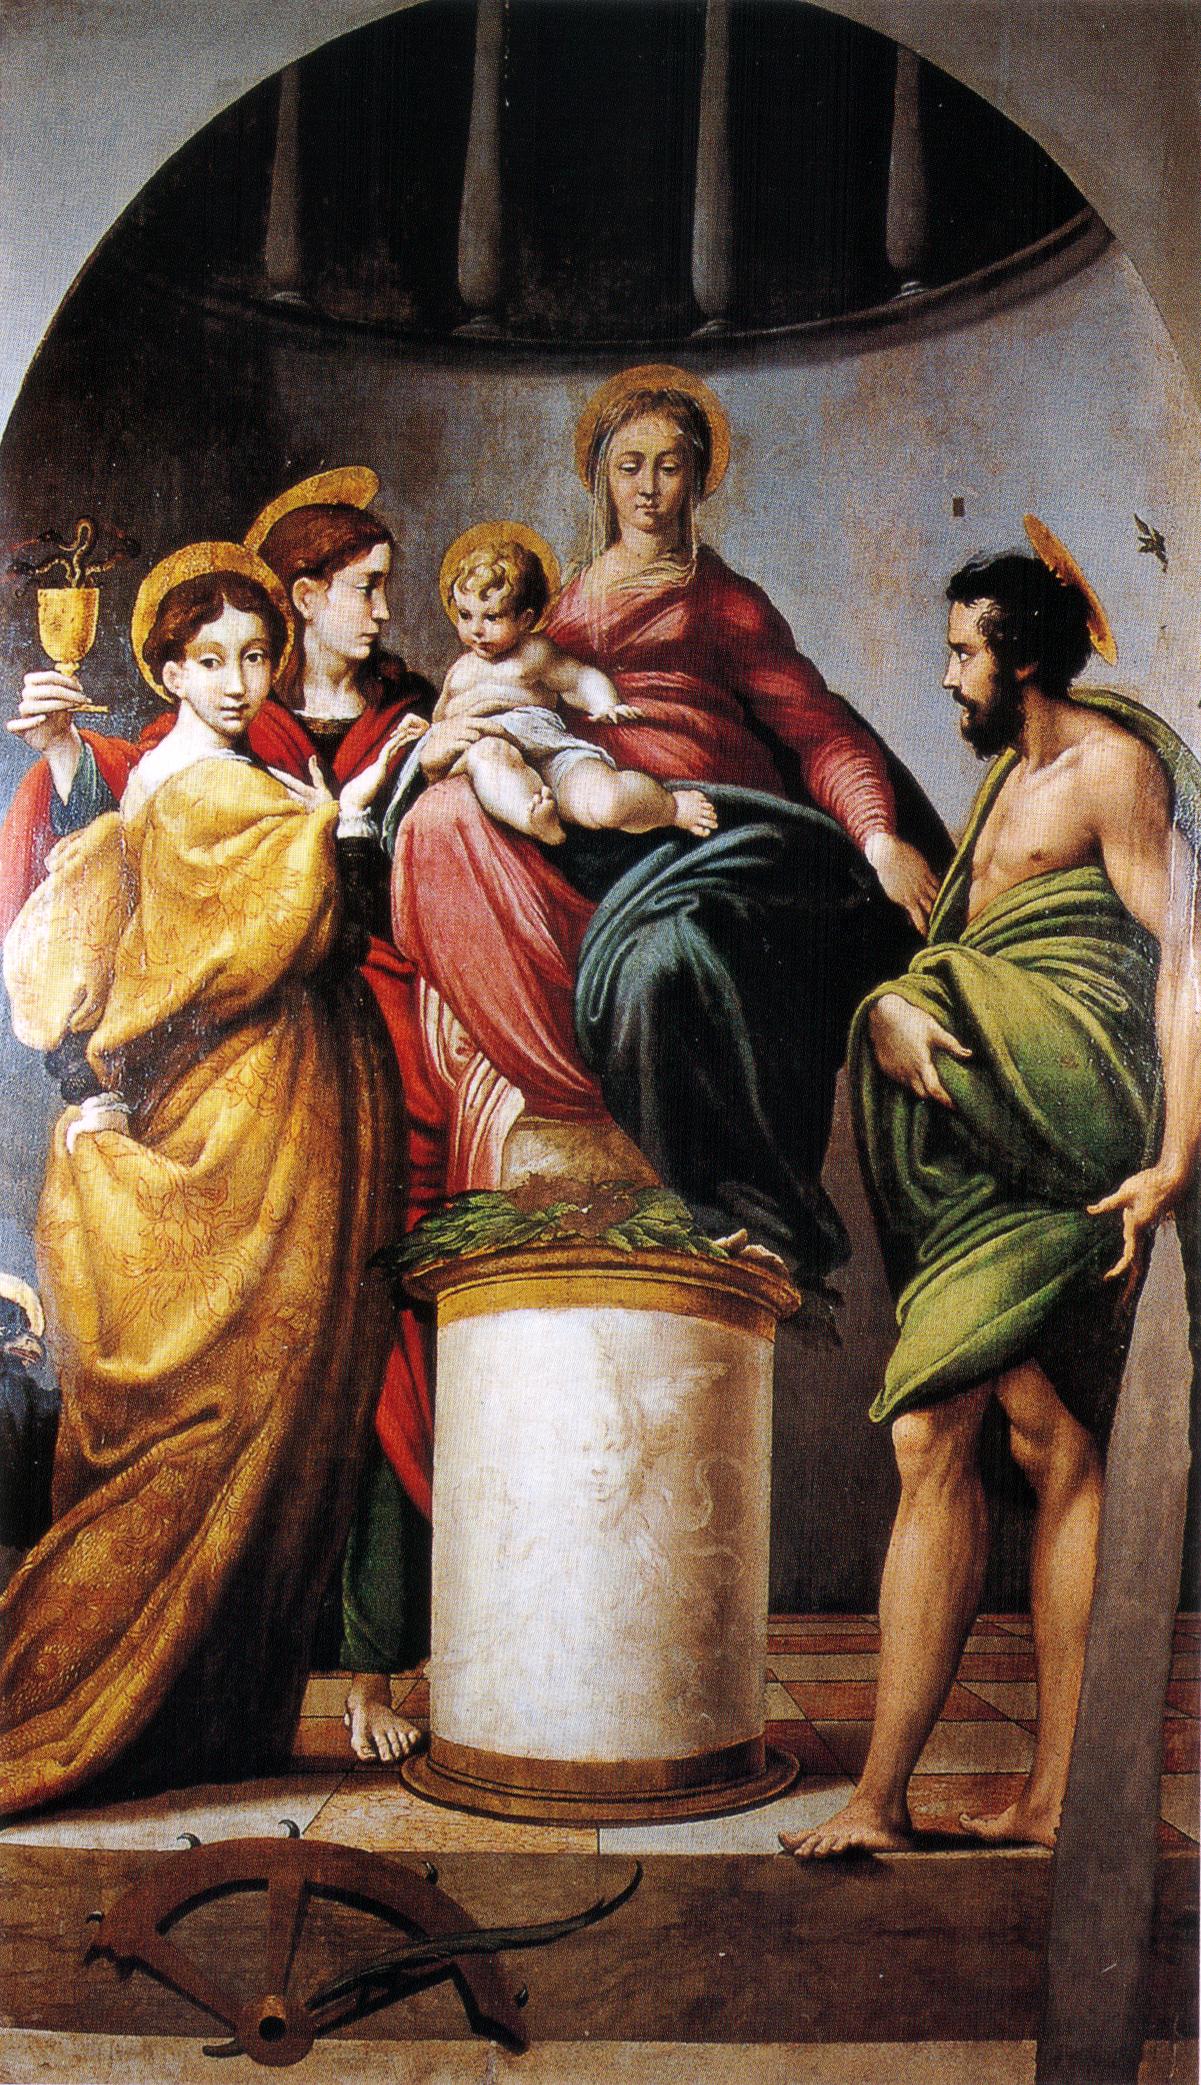 File:Parmigianino, pala di bardi.jpg - Wikimedia Commons